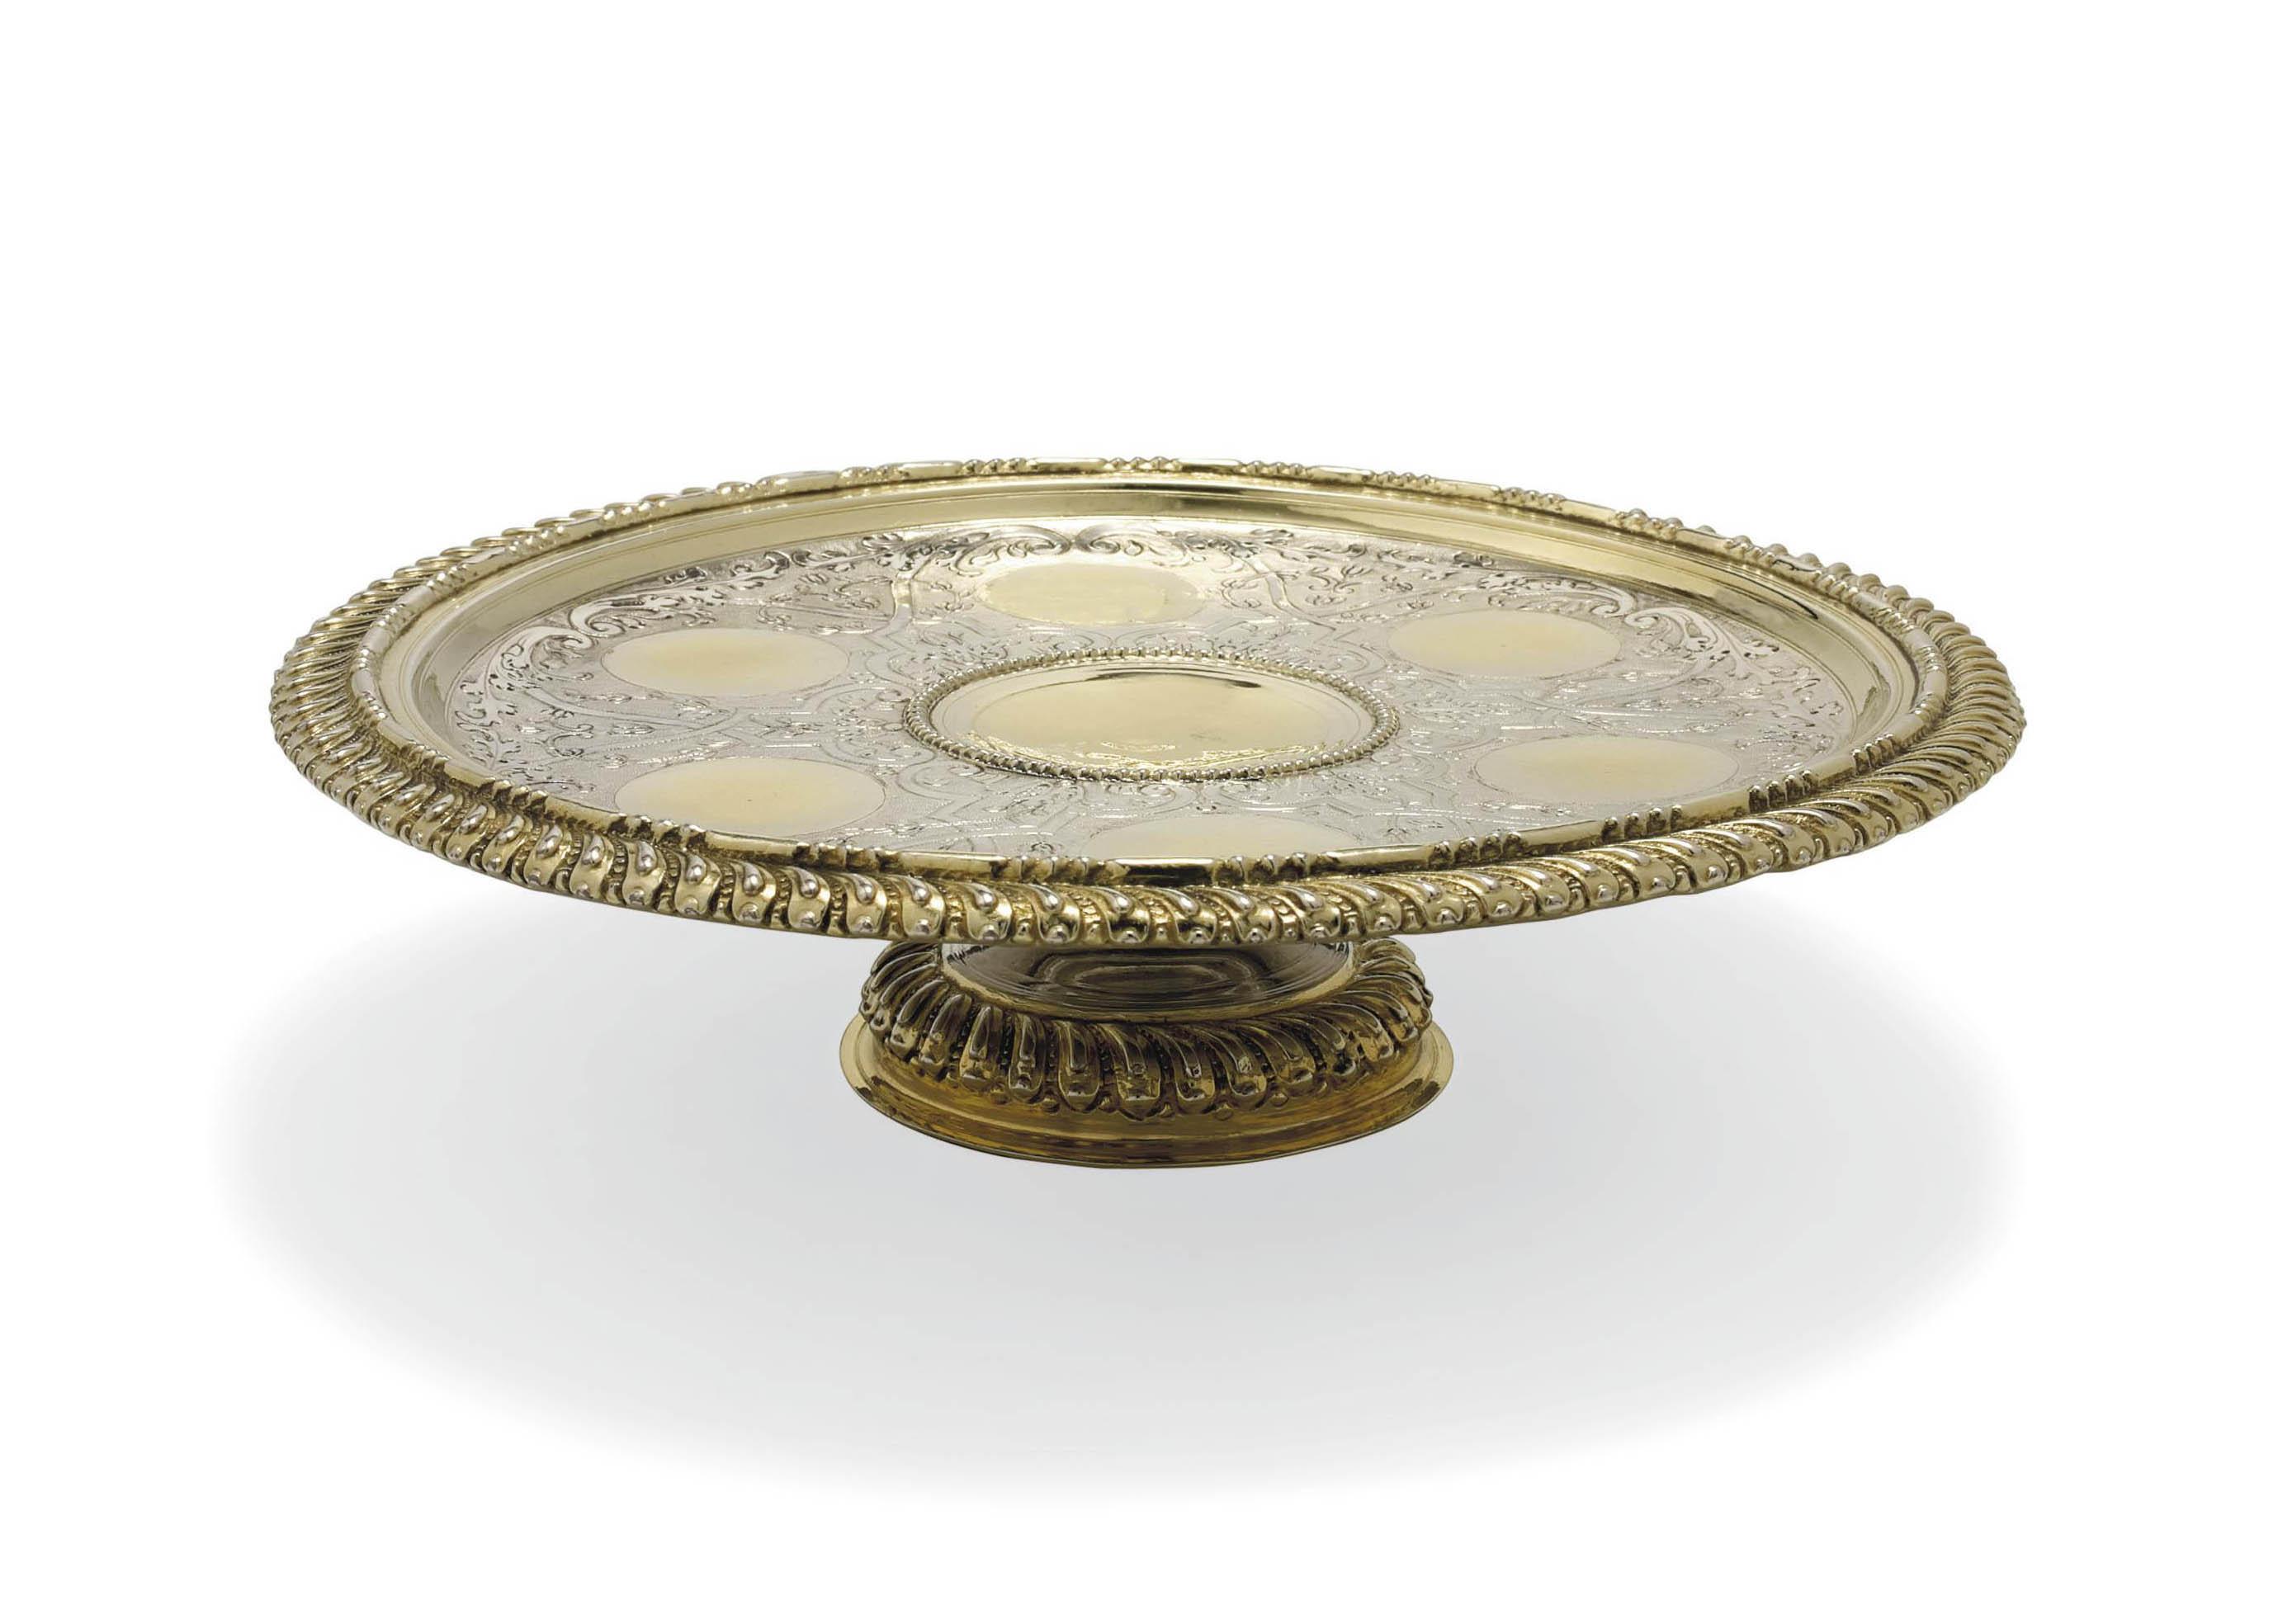 A GERMAN PARCEL-GILT SILVER TAZZA OR LIQUEUR GLASS STAND